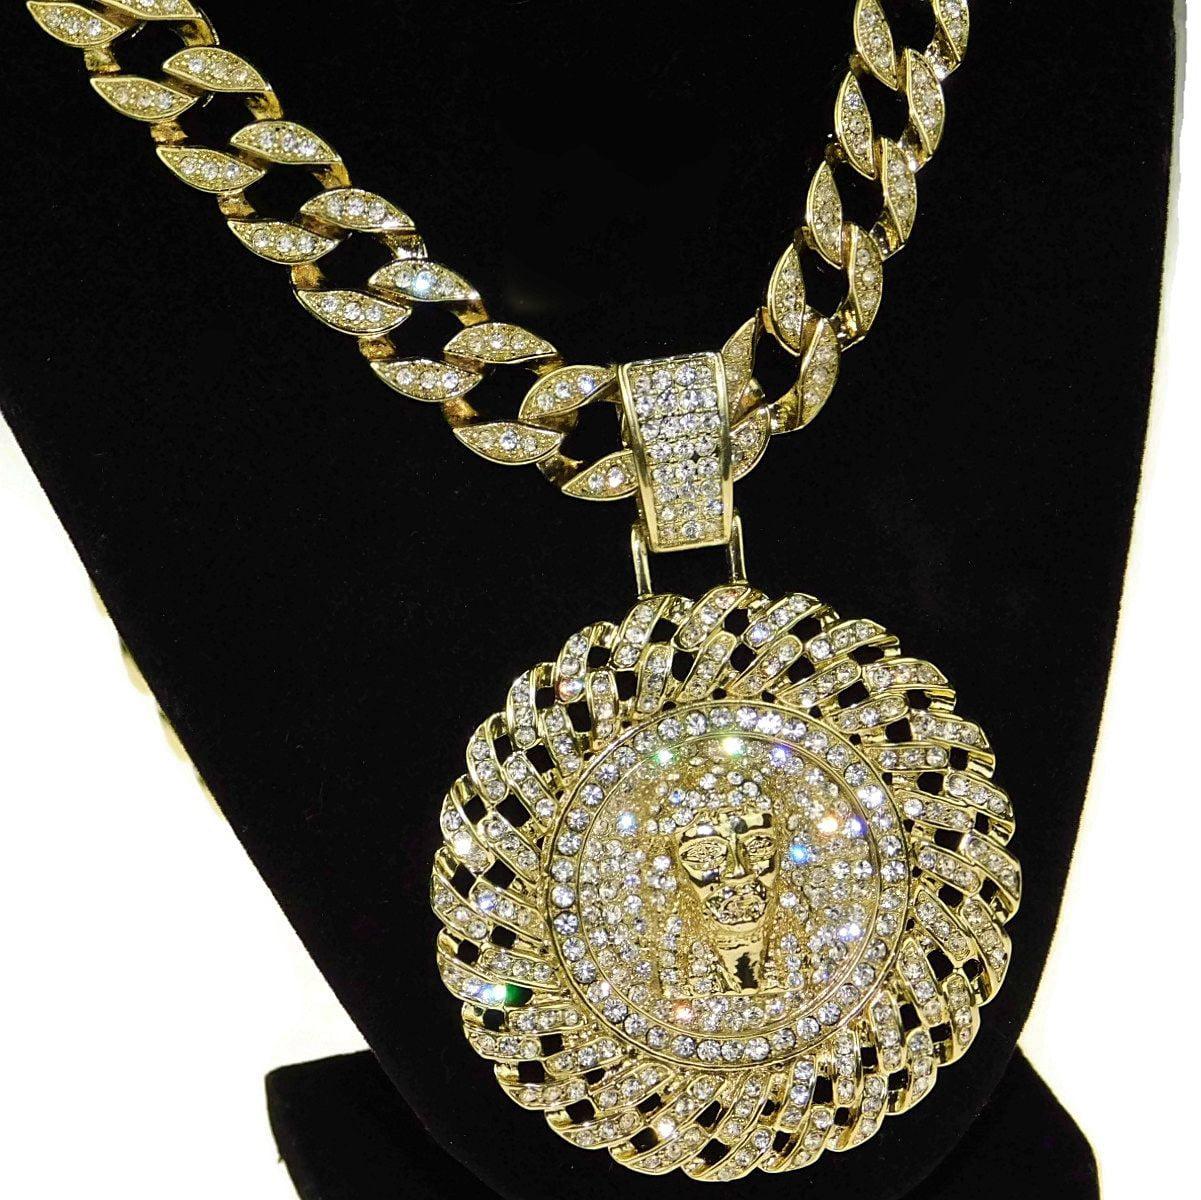 Bling Cartel Huge Jesus Piece Hip Hop Chain Medallion Cuban Pendant Gold Finish Bling 30 Hip Hop Necklace Walmart Com Walmart Com